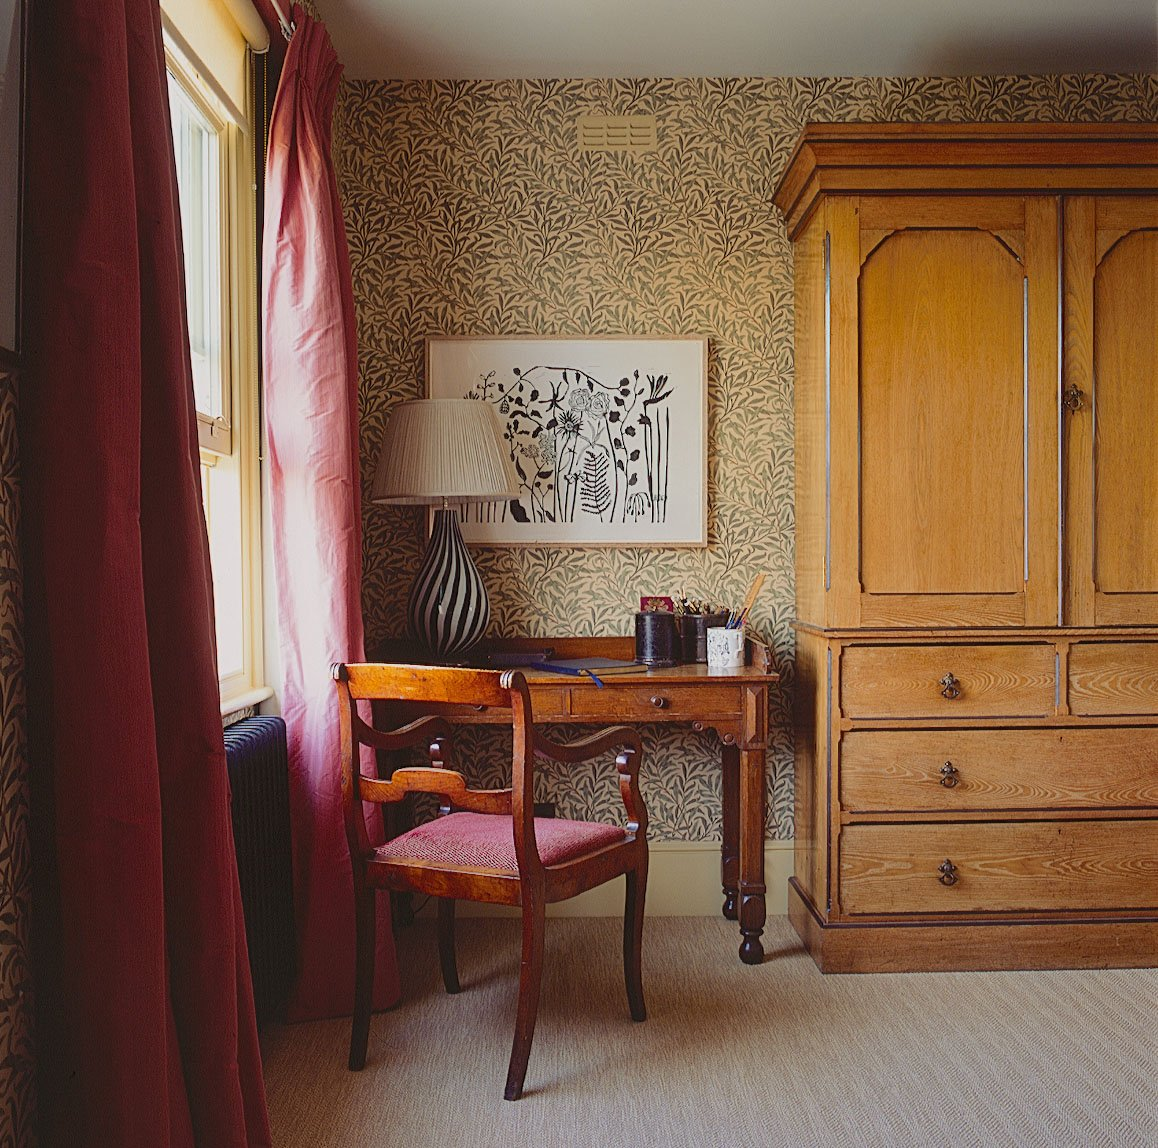 adam bray Adam Bray: The Best Interior Design Projects 5 18